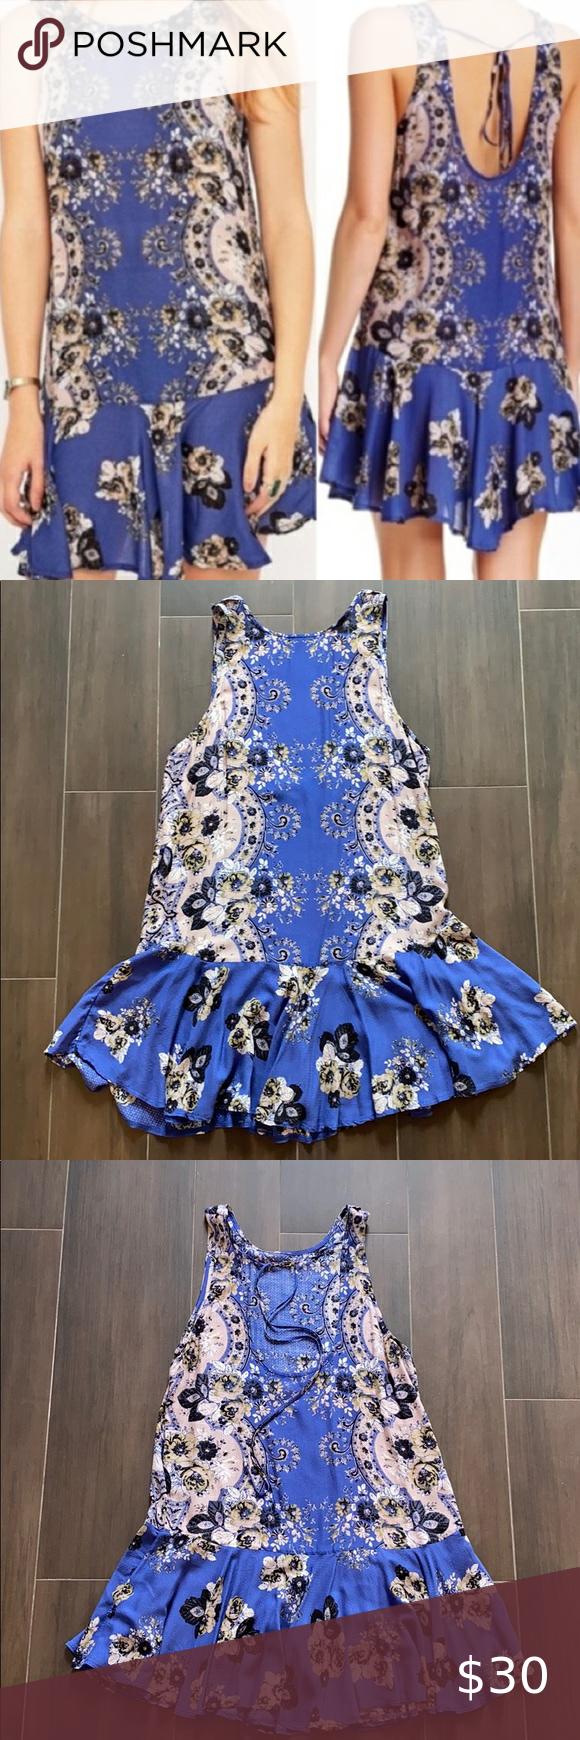 Free People Intimately Printed Slip Dress